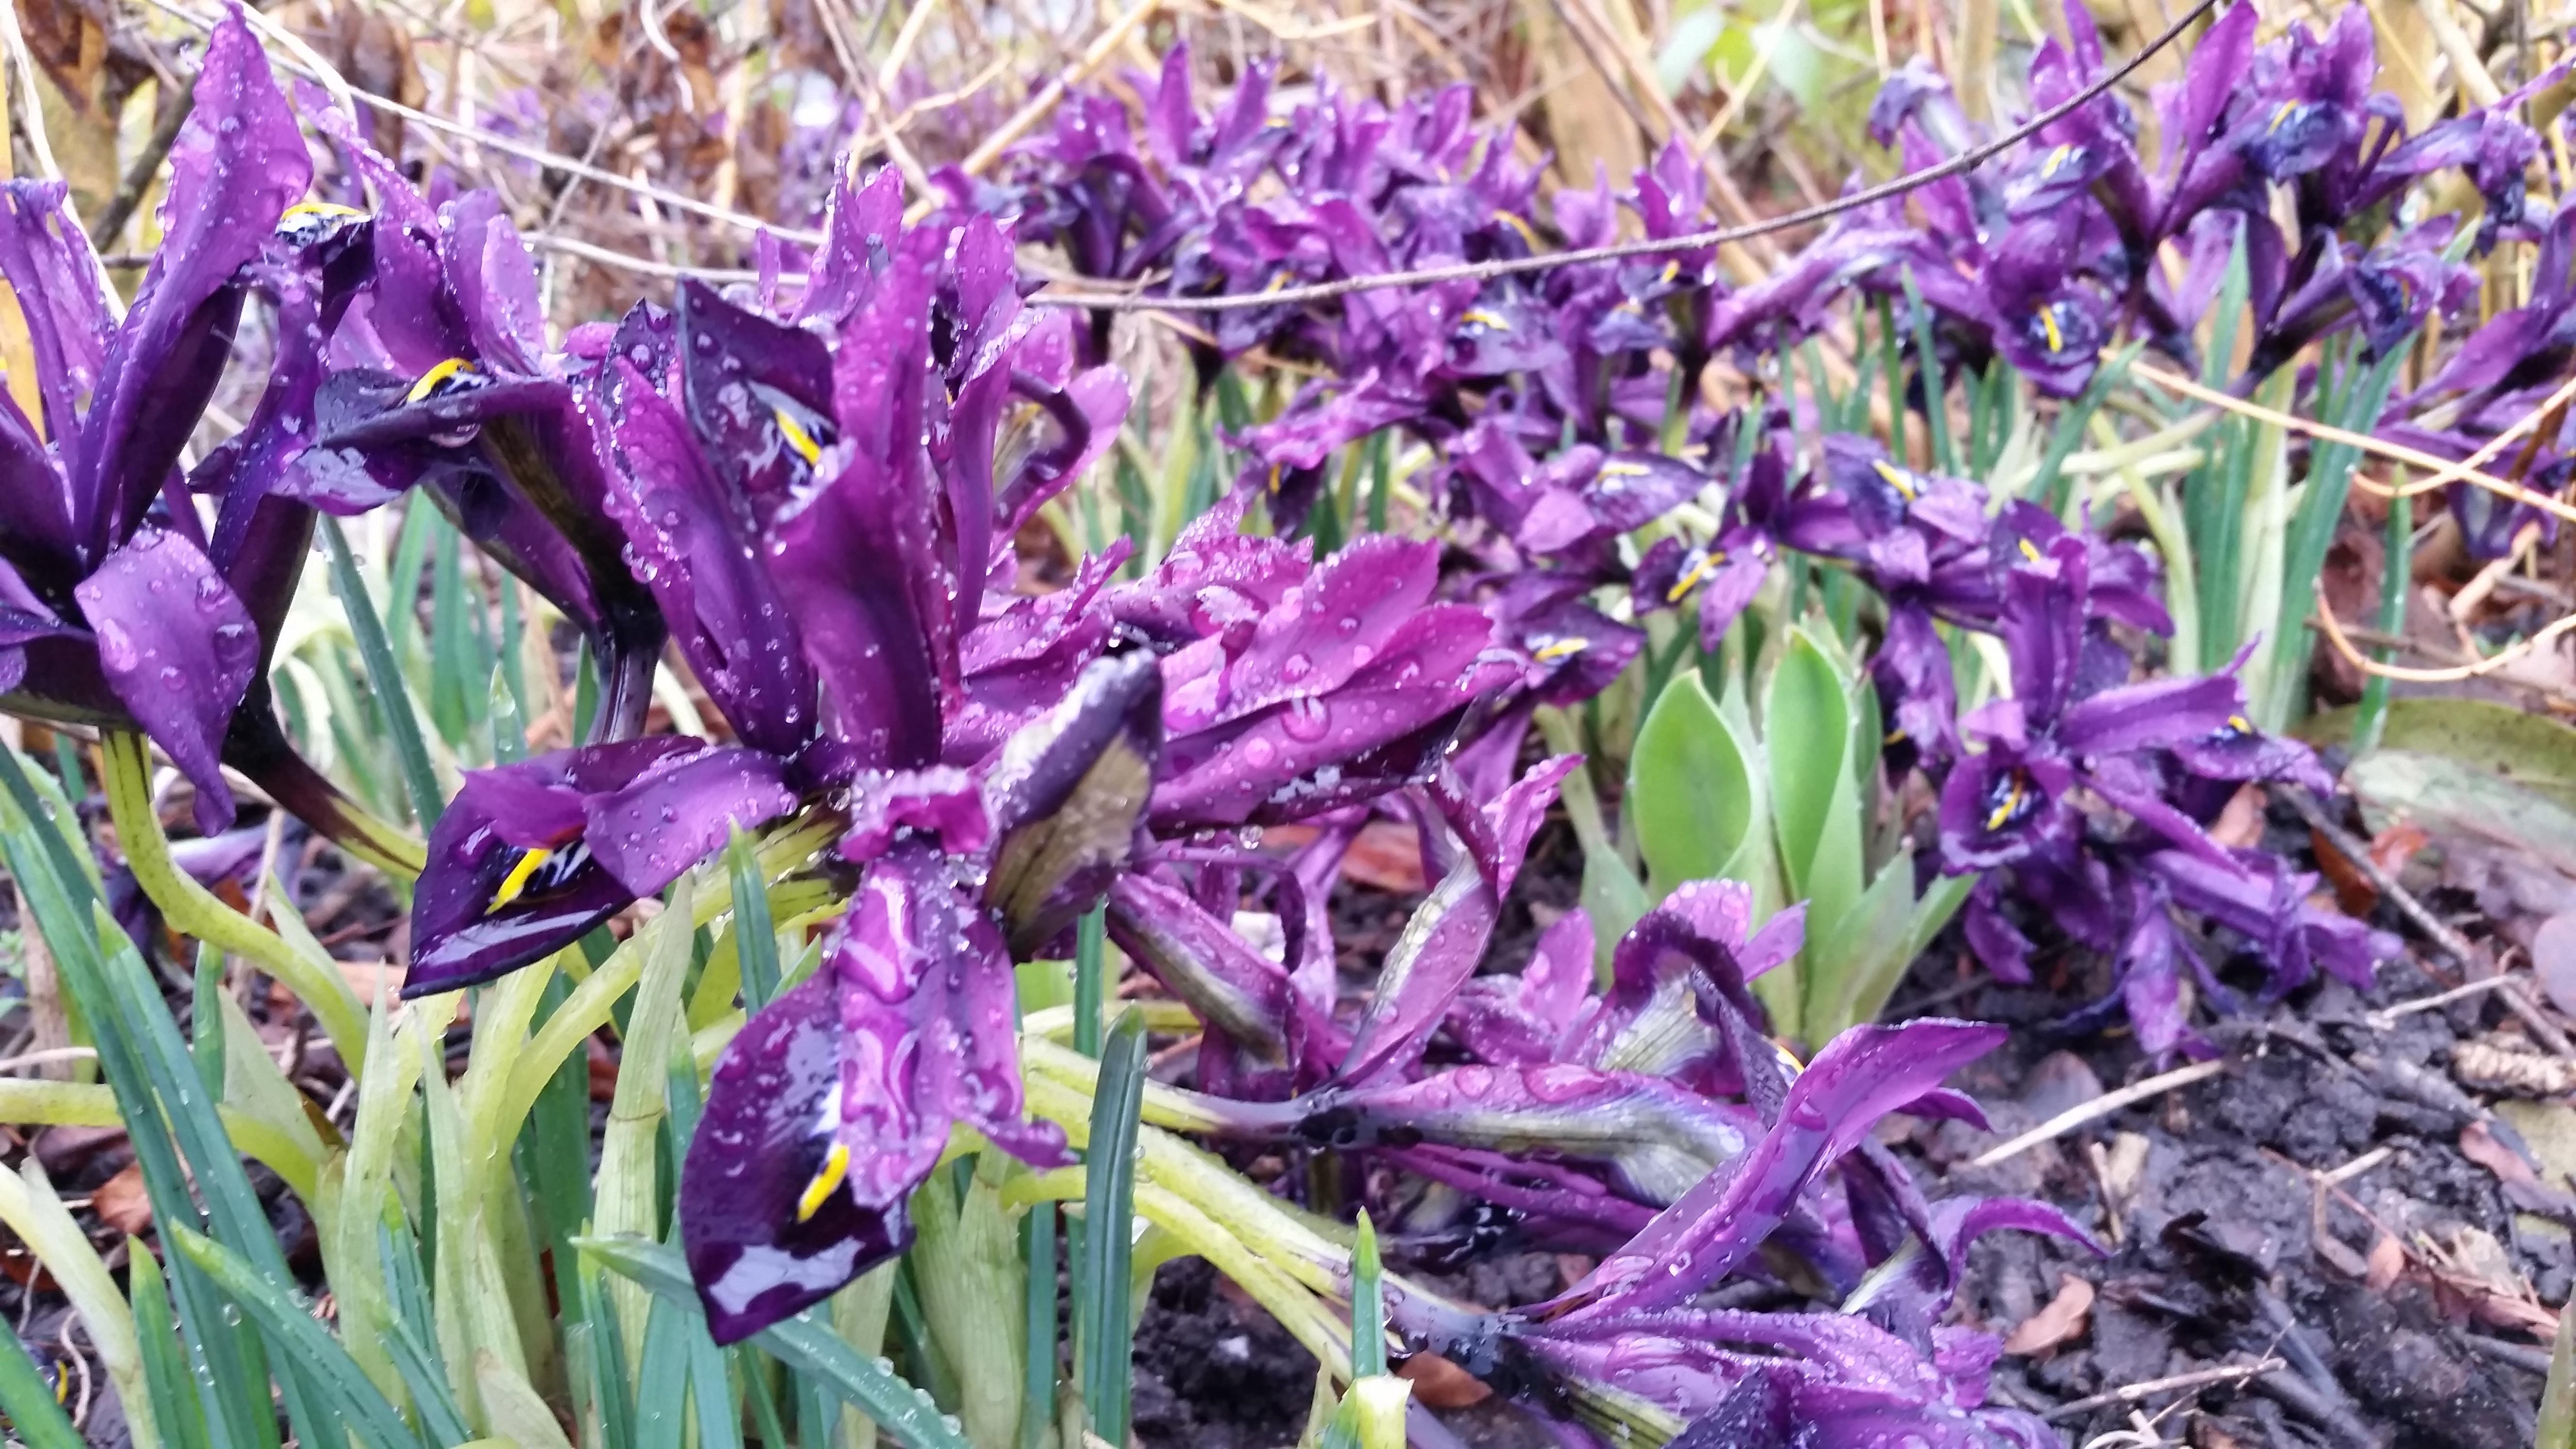 Purple irises at Dunham Massey, National Trust 19 Feb 2018